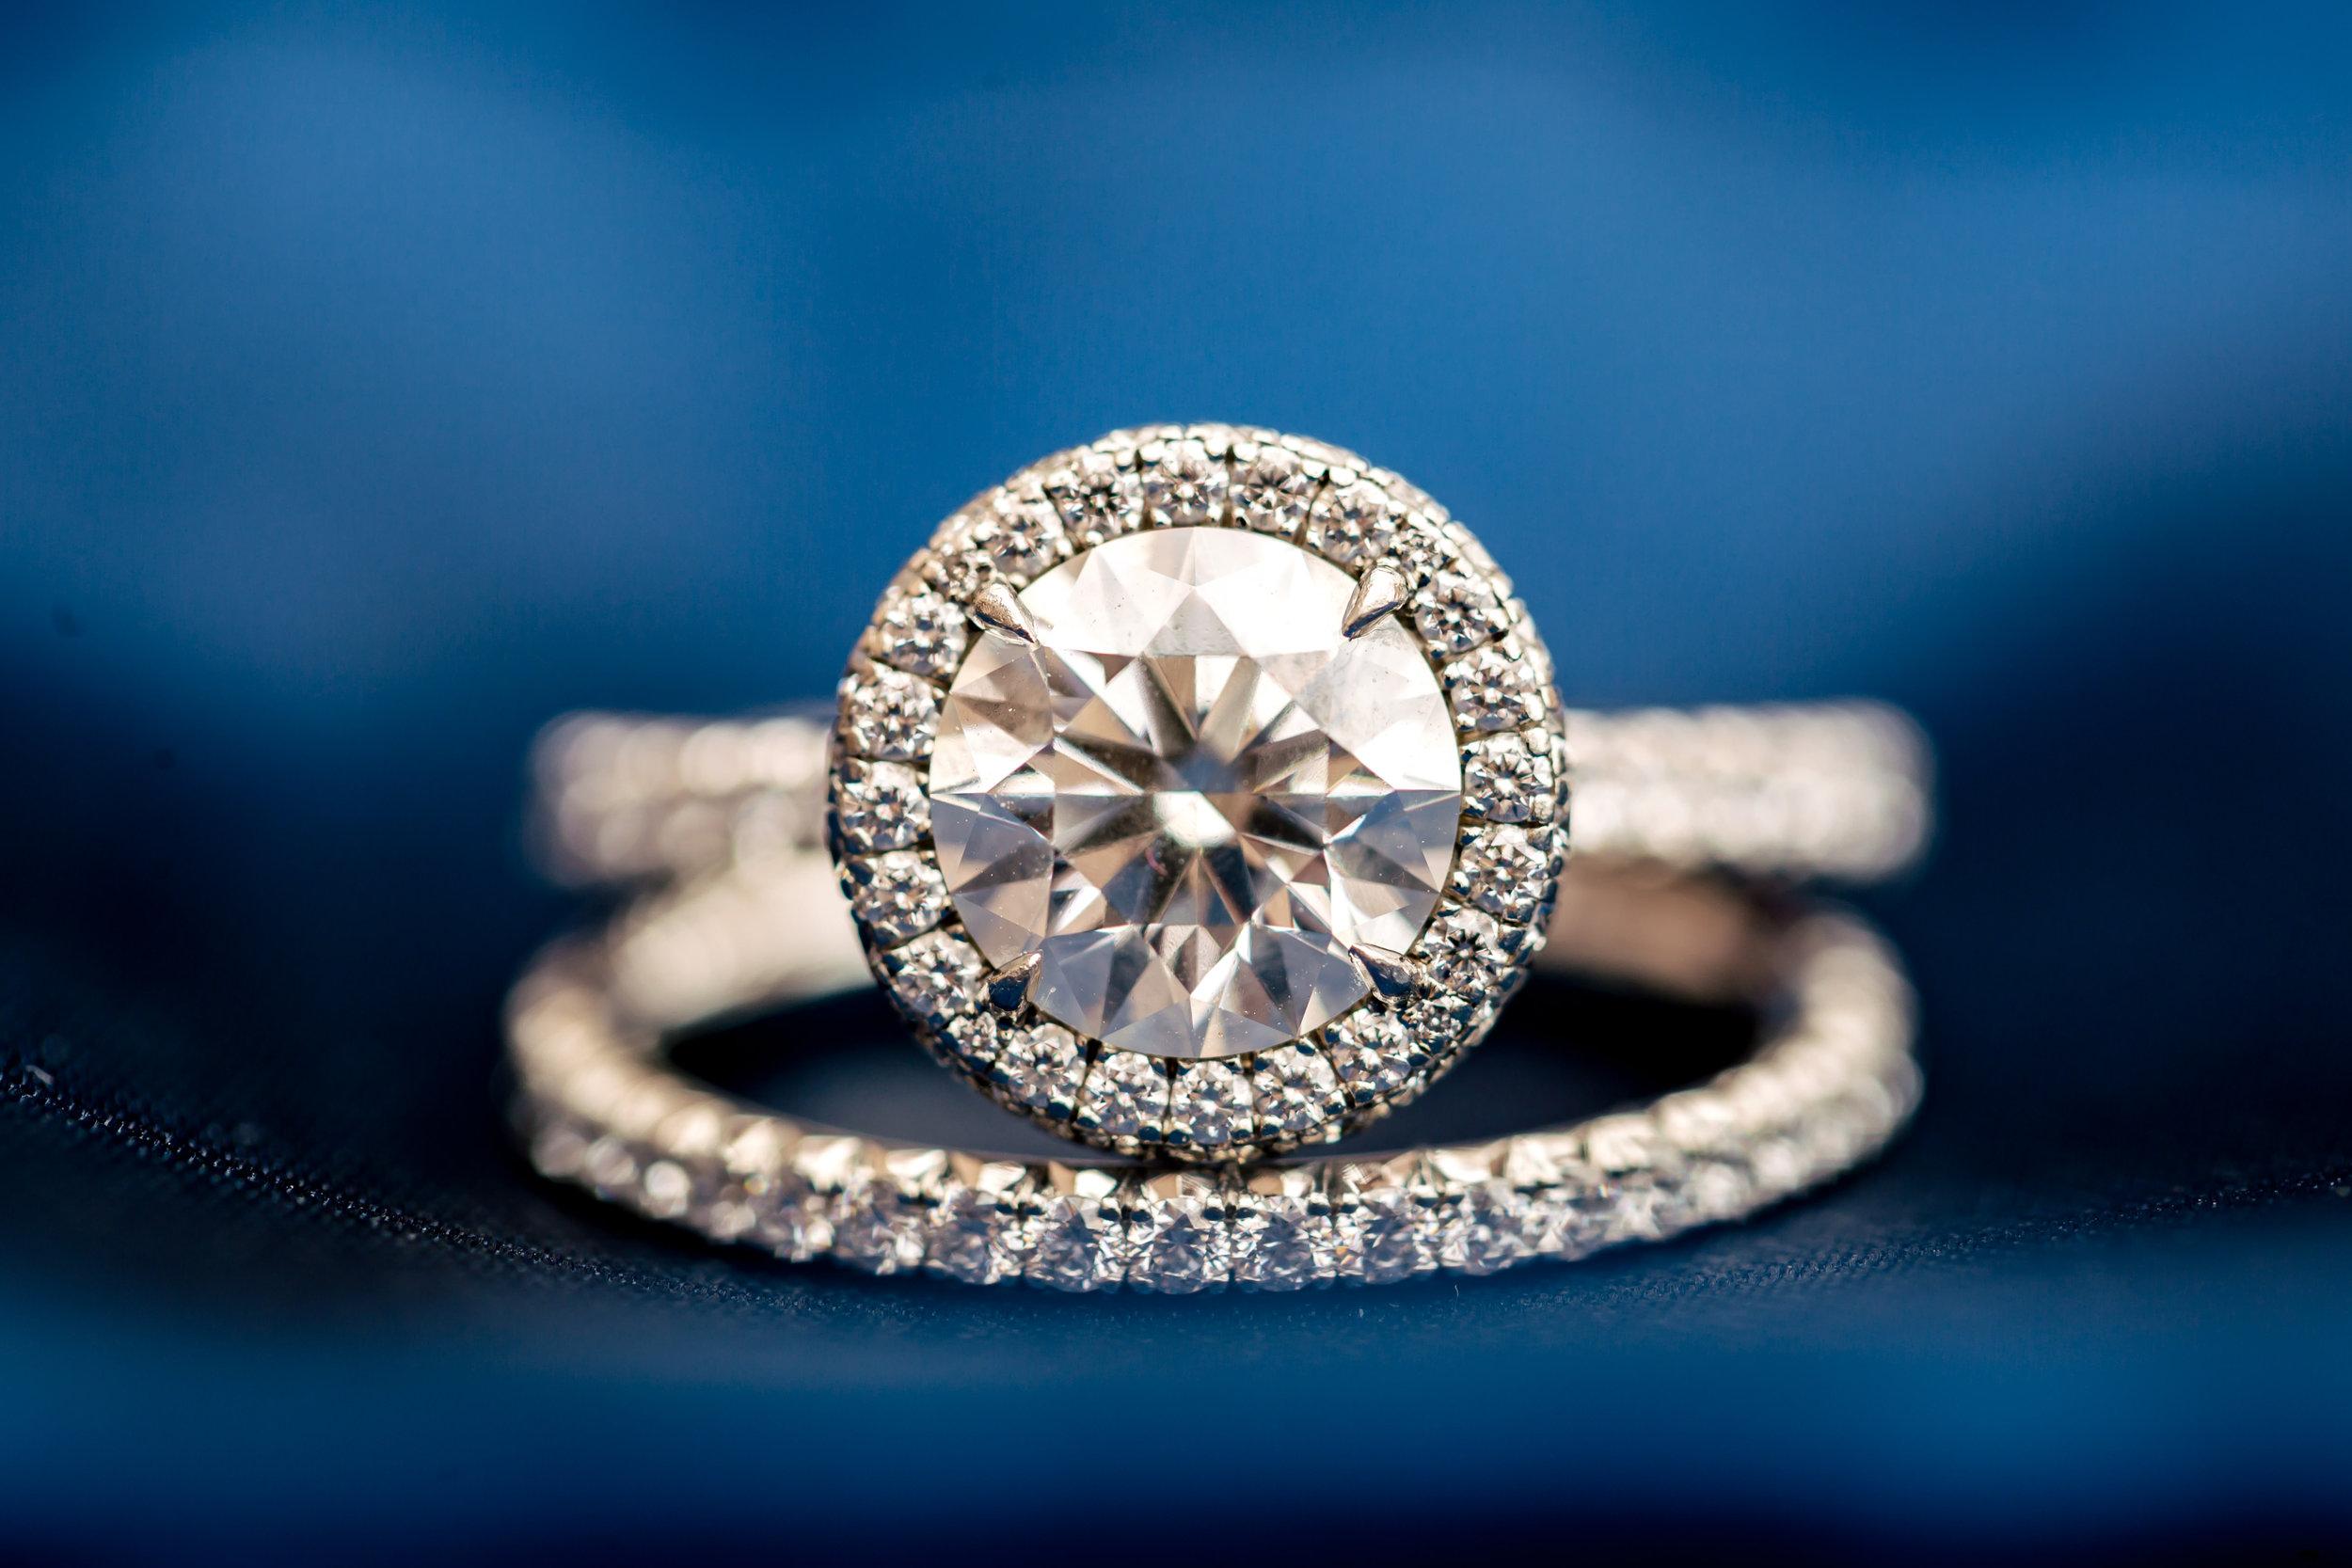 www.santabarbarawedding.com   Rewind Photography   Hilton Santa Barbara Beachfront Resort   Events by M and M   Wedding Rings